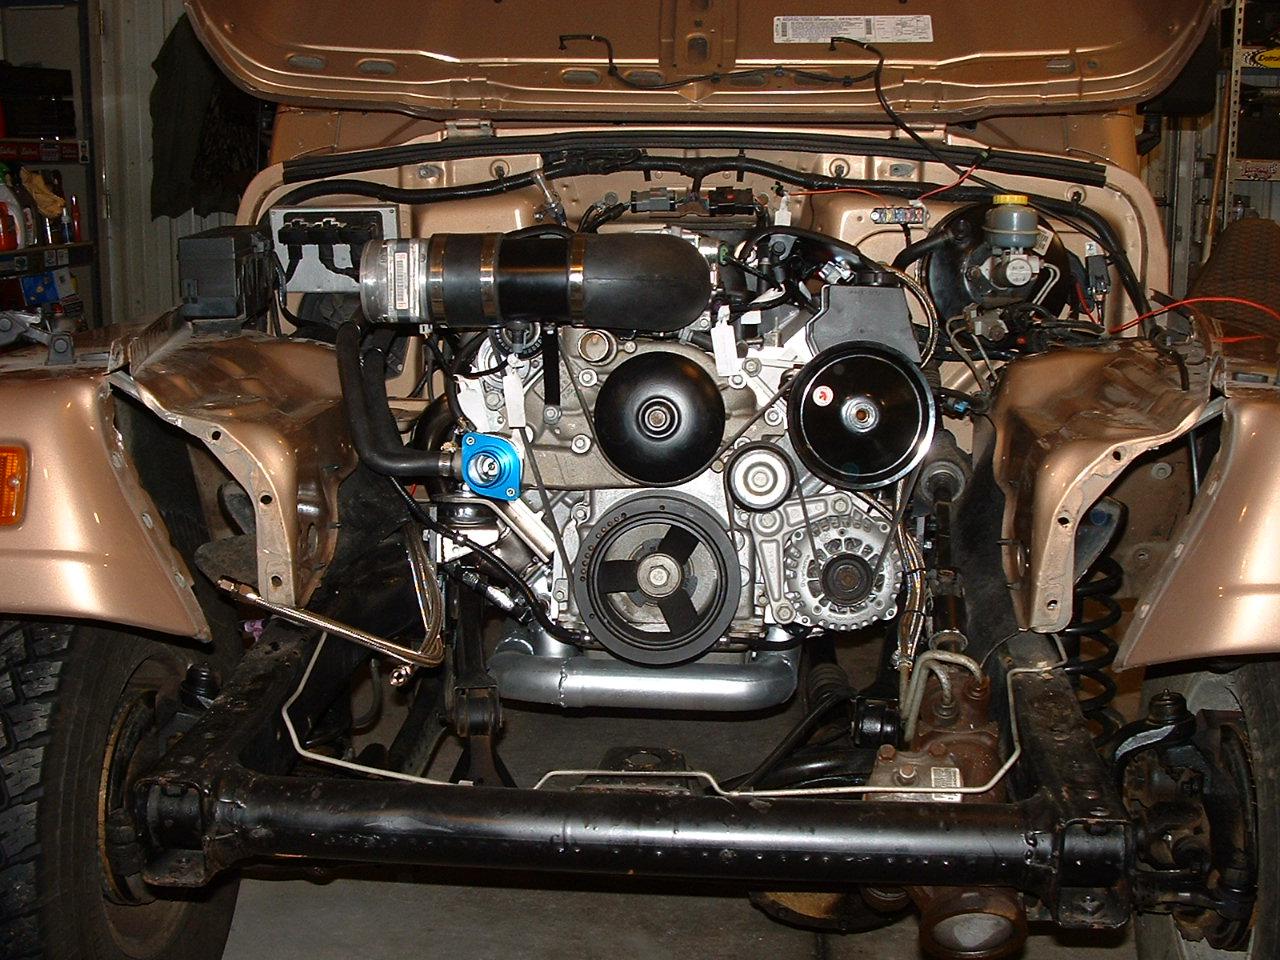 hight resolution of  99 wrangler ls1 ls1 jeep engine pics 003 jpg